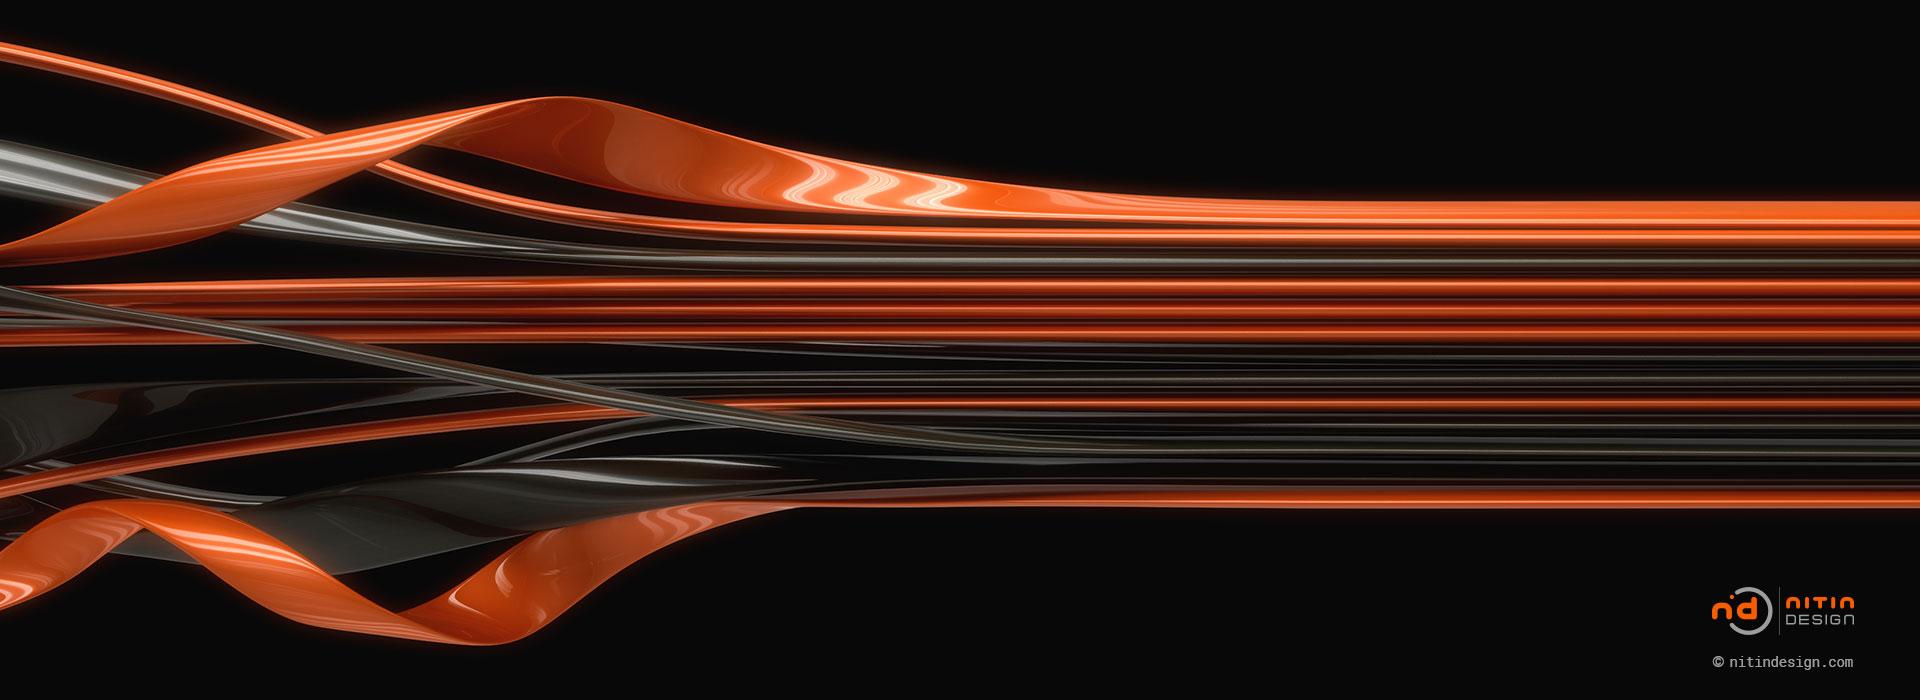 oglay-Nitin-Design